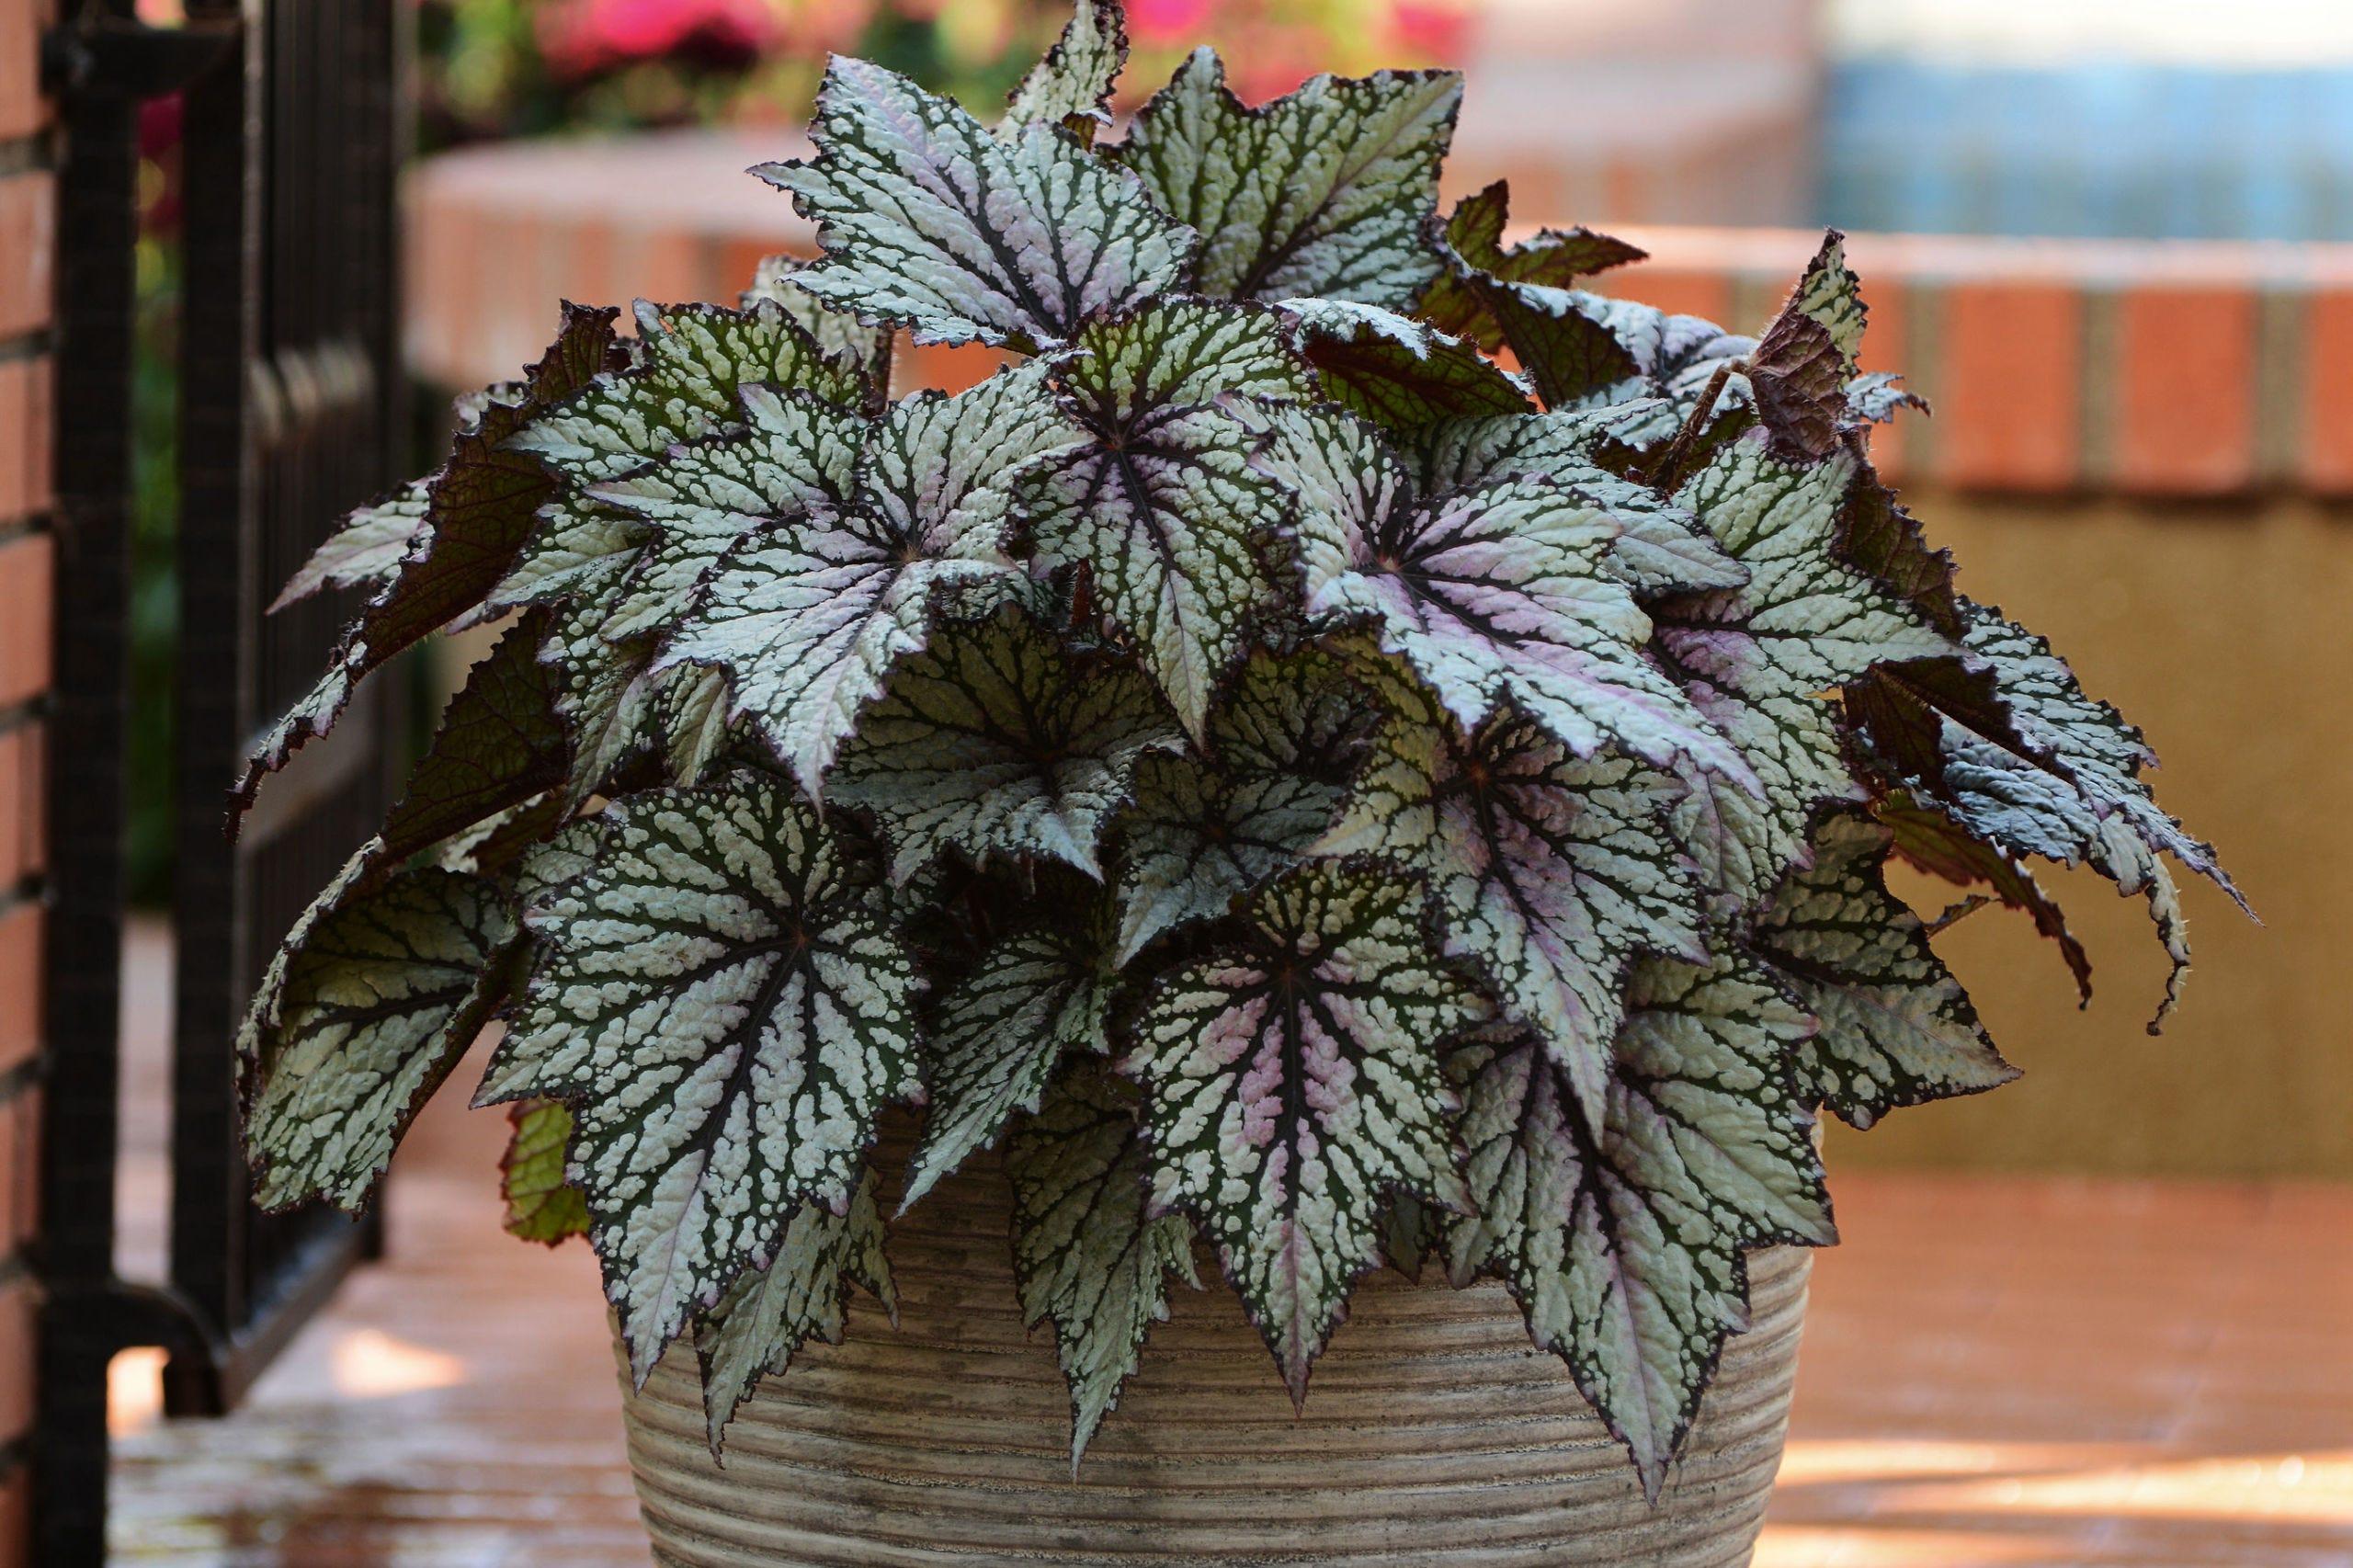 Flowerpot, Flower, Green, Plant, Houseplant, Botany, Leaf, Herbaceous plant, Table, Window,